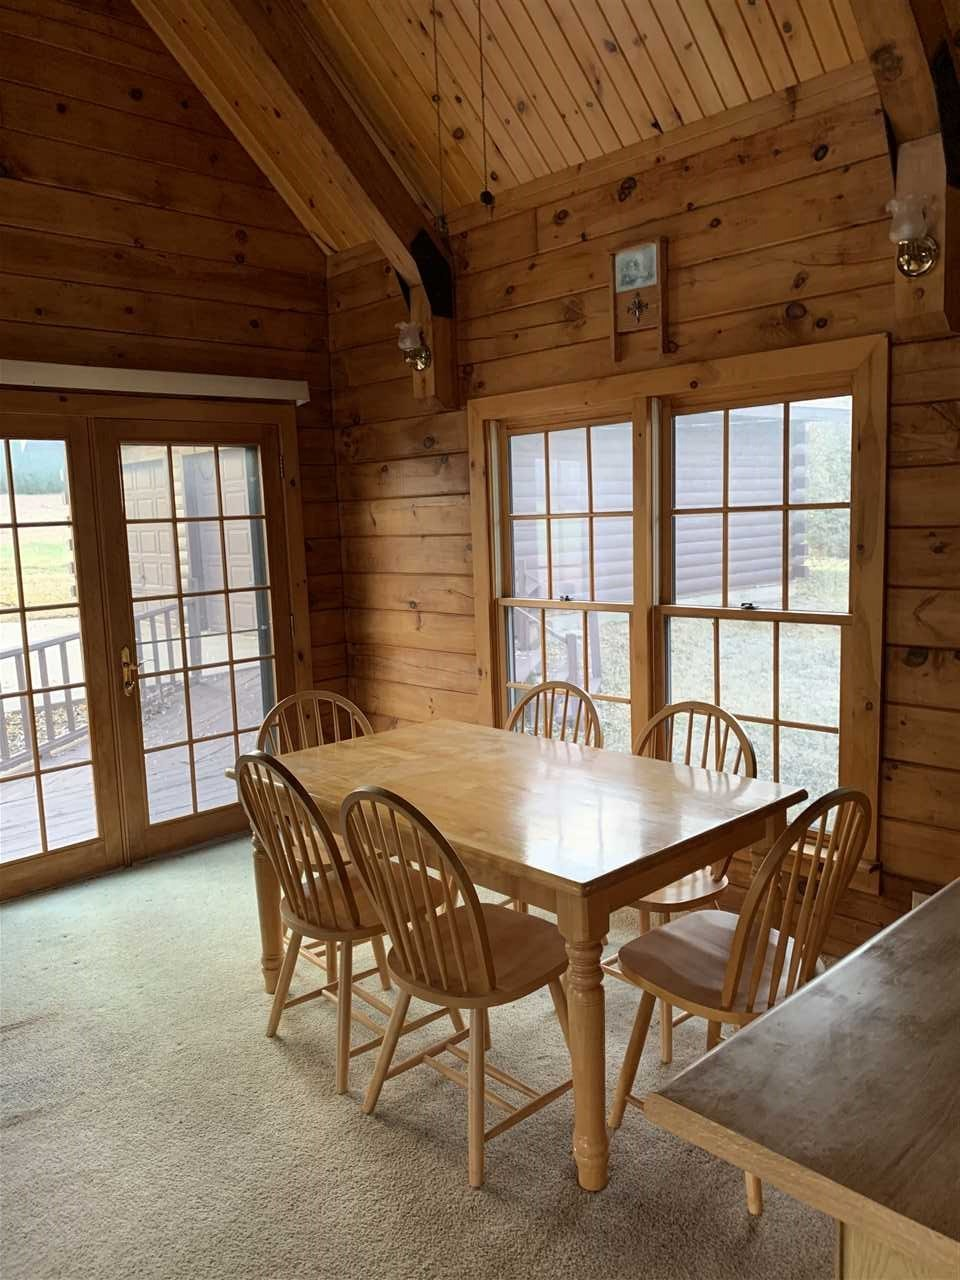 #century21groupone,#homesforsaleponcacity,#poncacityrealestate | 10301 Cedar Bluff Rd. Kaw City, OK 74641 19